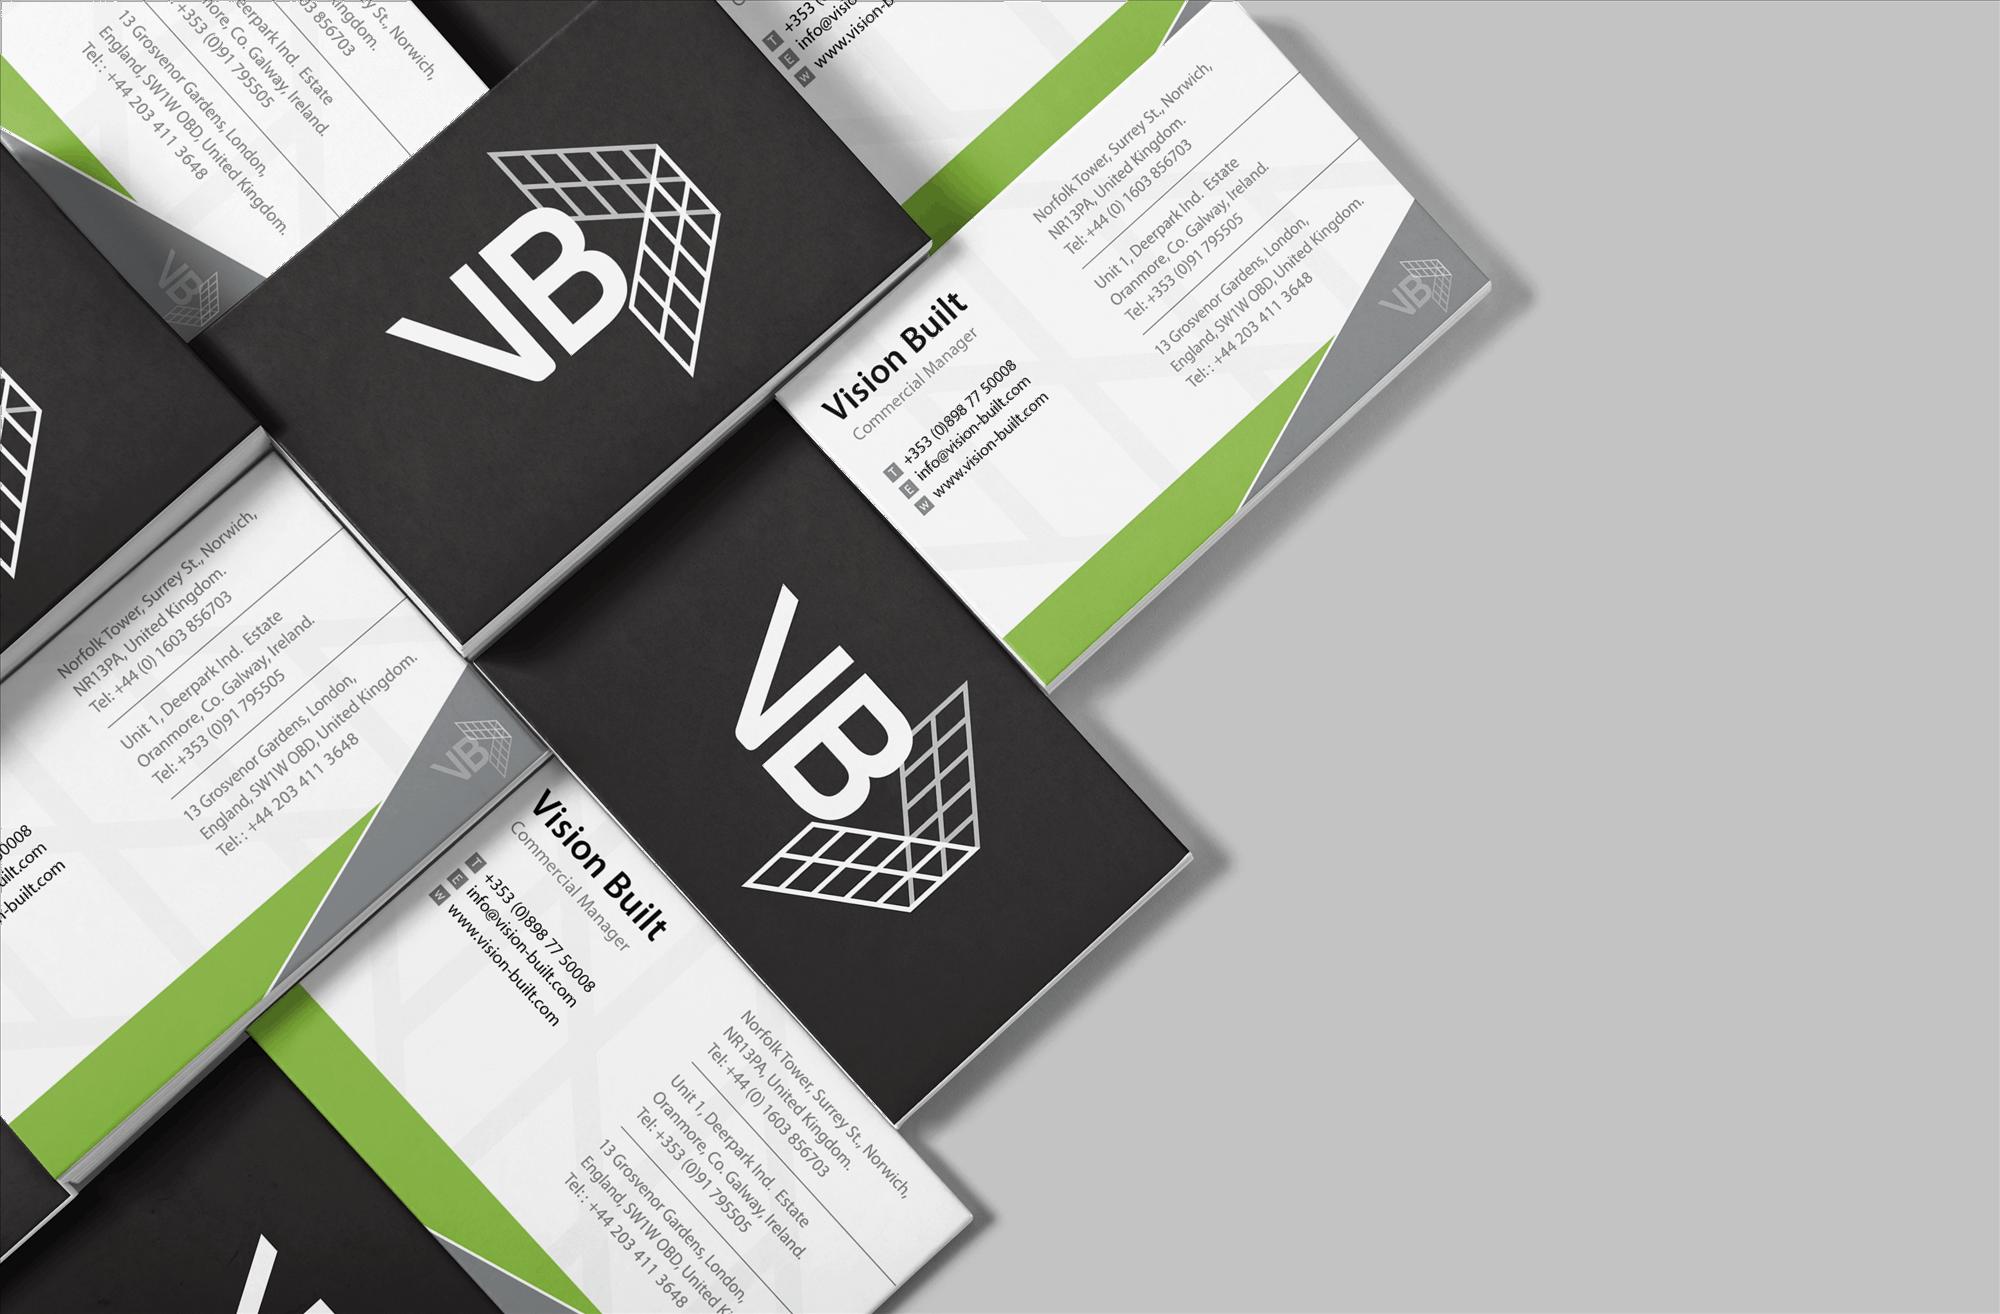 Vision Built - Print Design